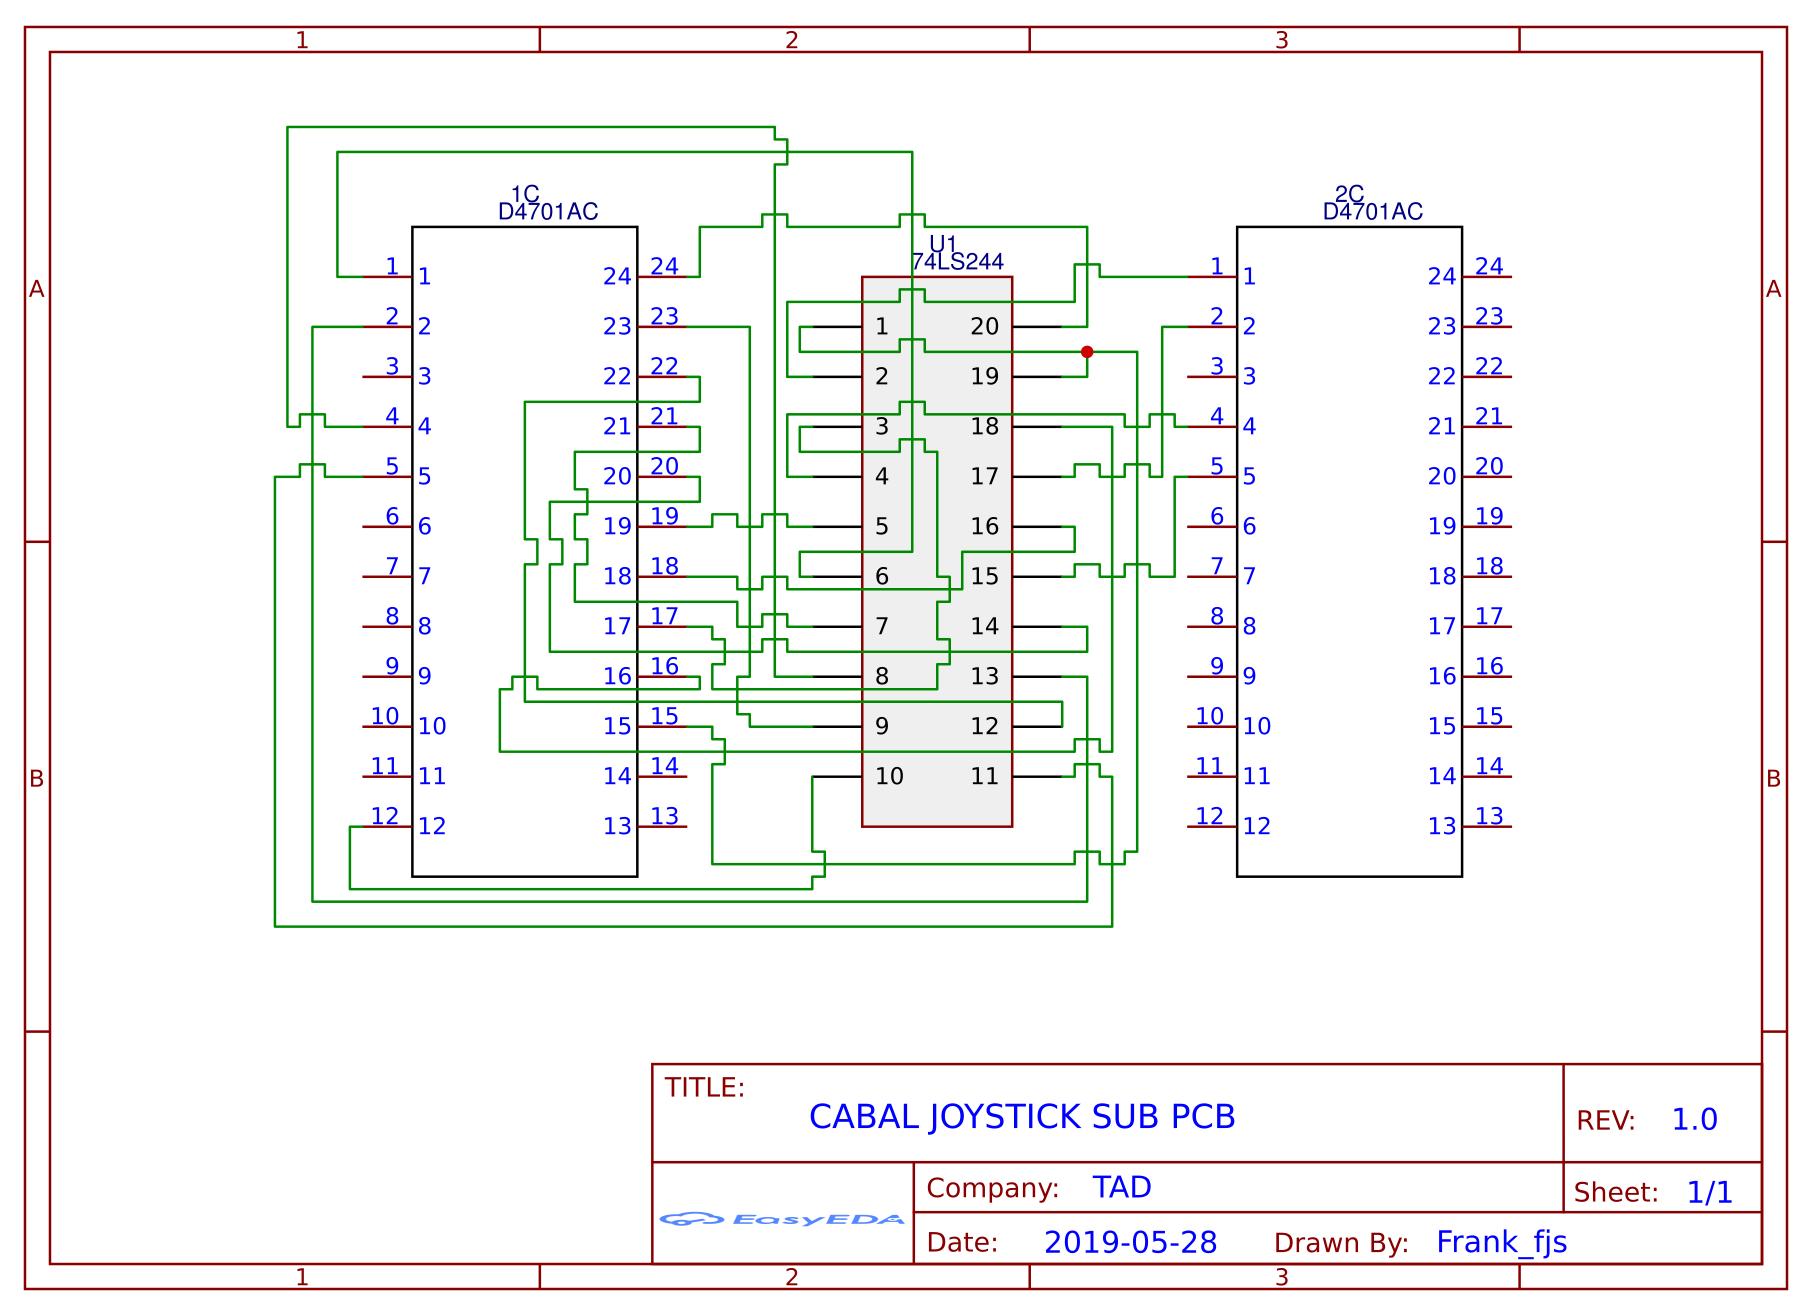 Schematic_CABAL-JOYSTICK-SUB.png